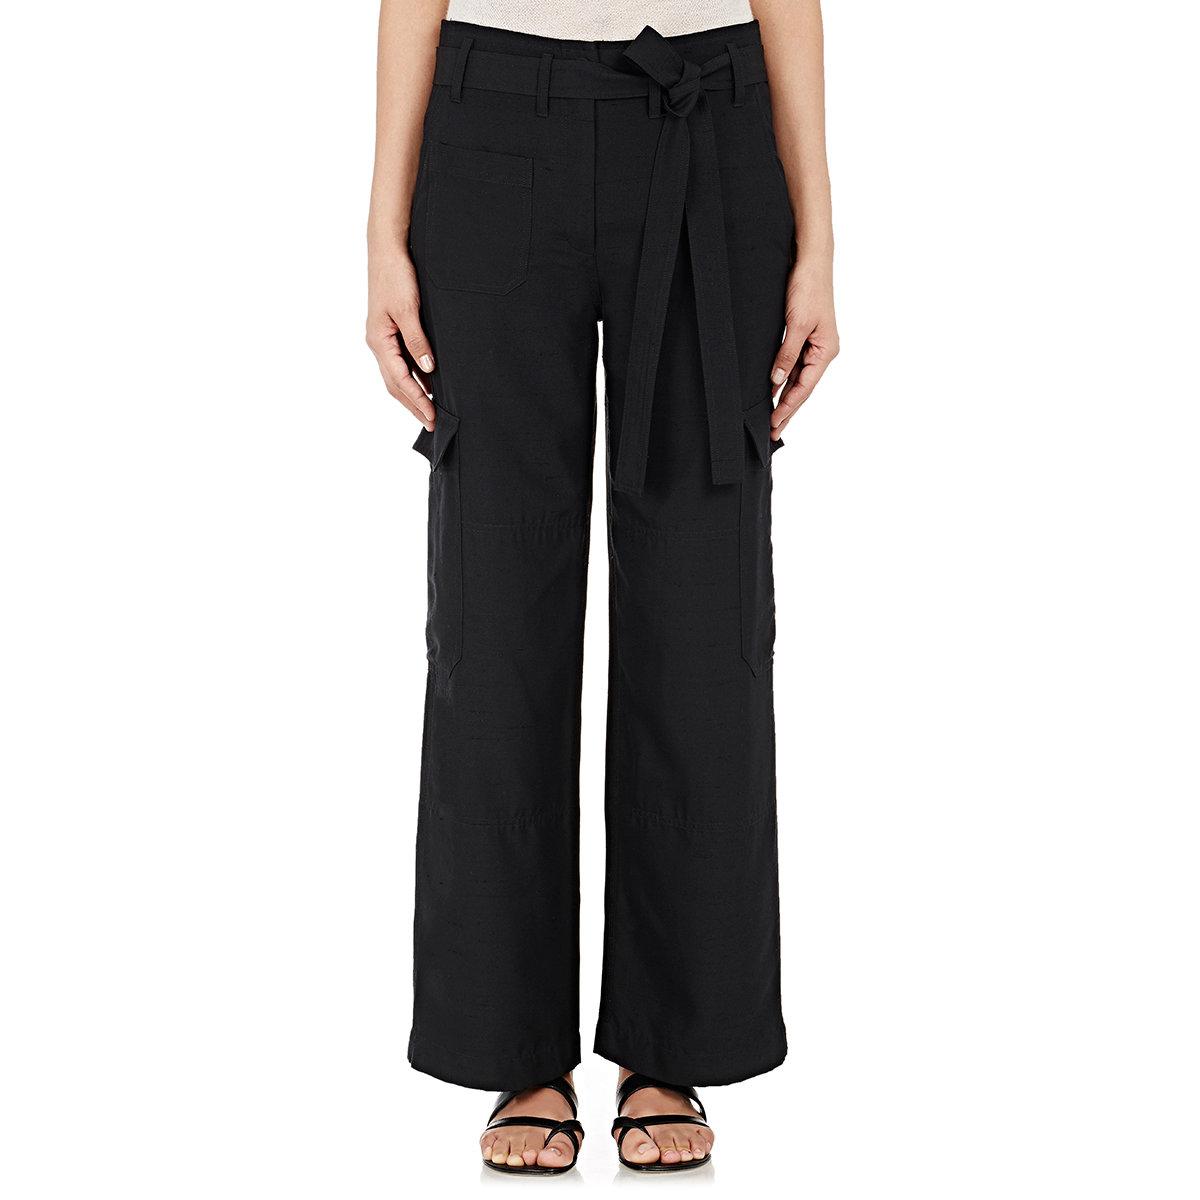 Wide Leg Cargo Pants - Pant Row